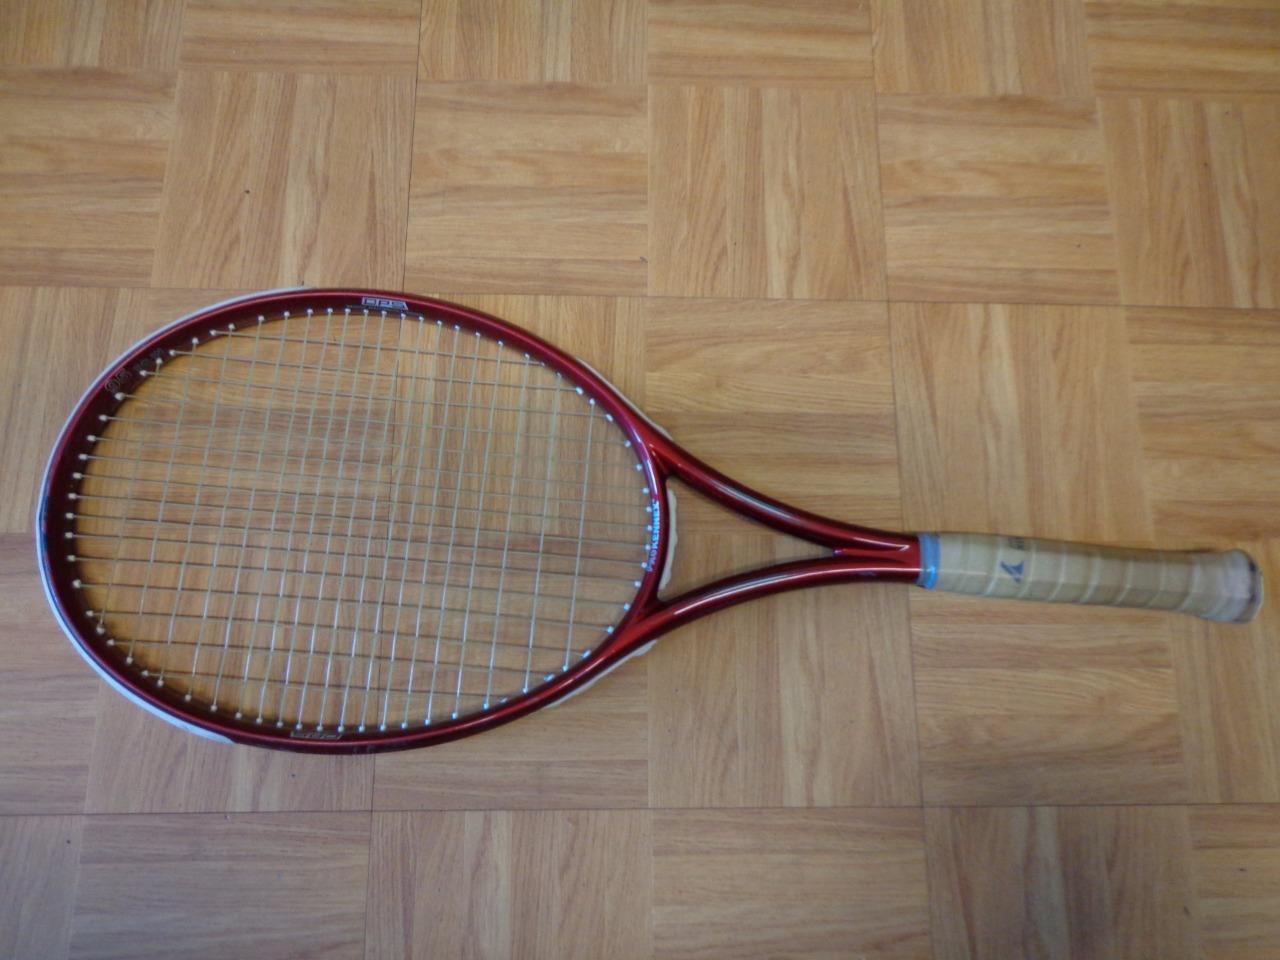 Pro Kennex Cerámica Destiny 95 cabeza 4 3 8 Grip Tenis Raqueta